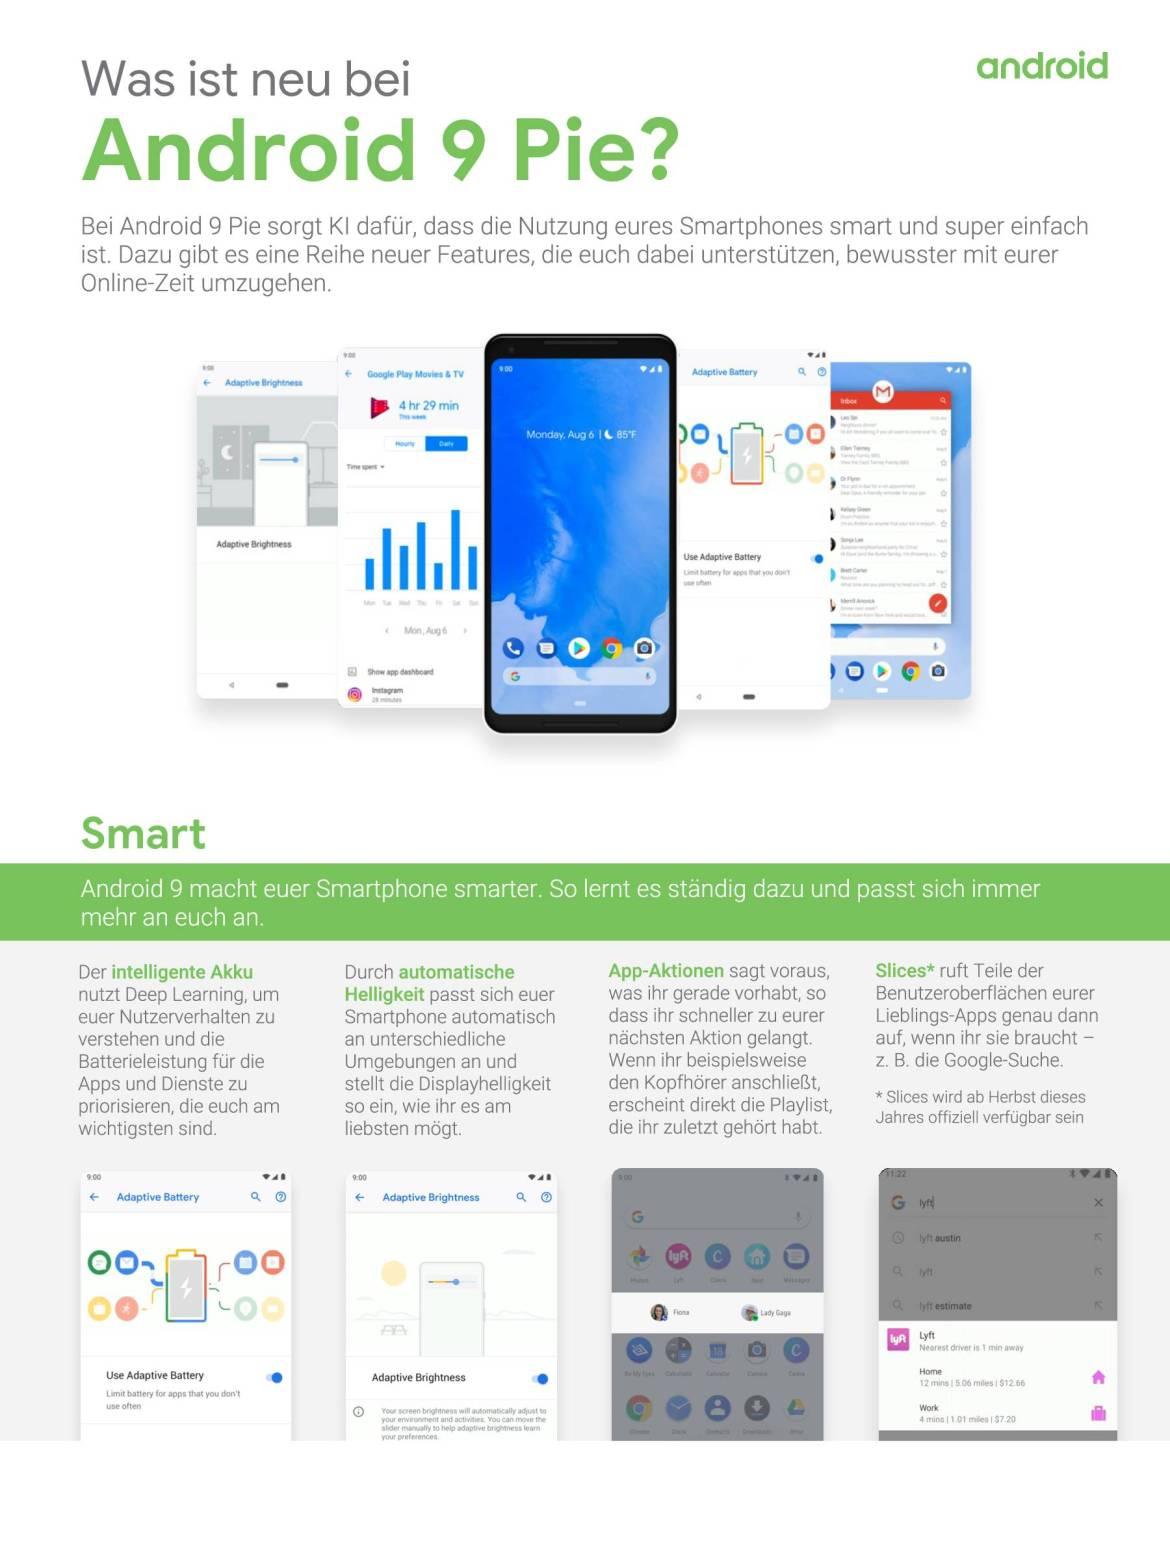 Was ist neu bei Android 9 aka Android Pie? (Grafik: Google)